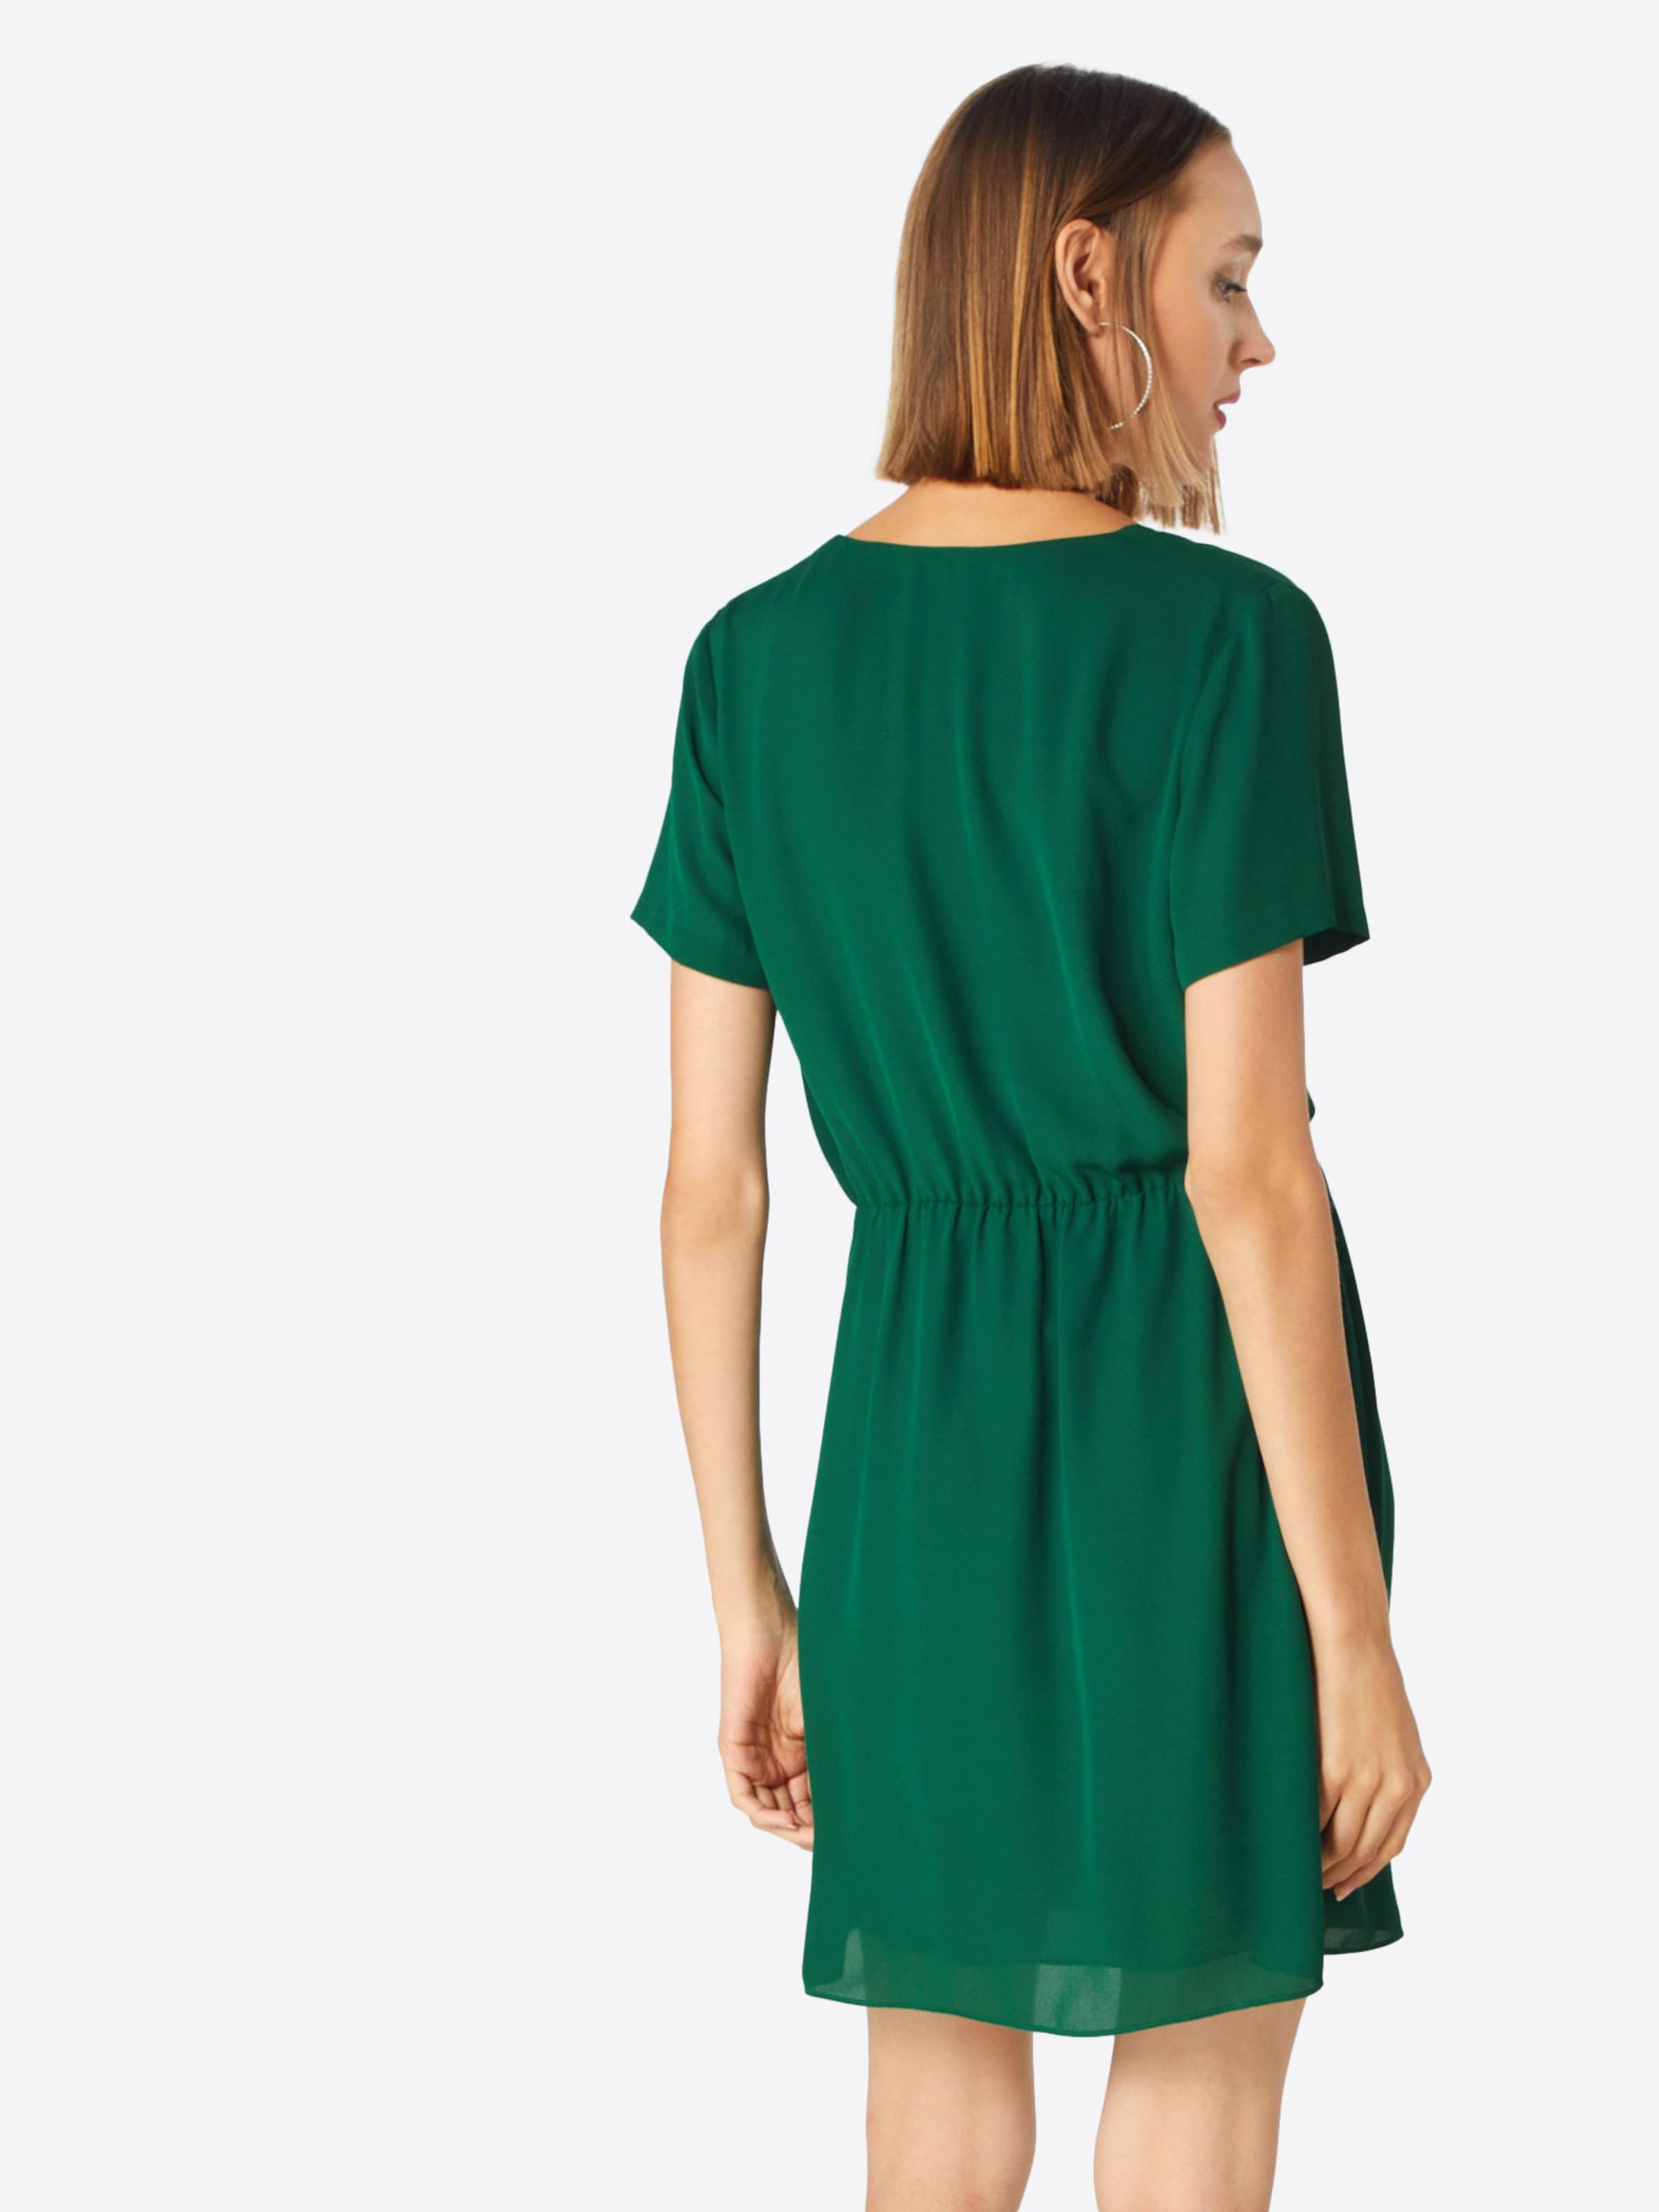 Robe D'été En Vert Samsoeamp; Samsoeamp; y7Yg6vbf